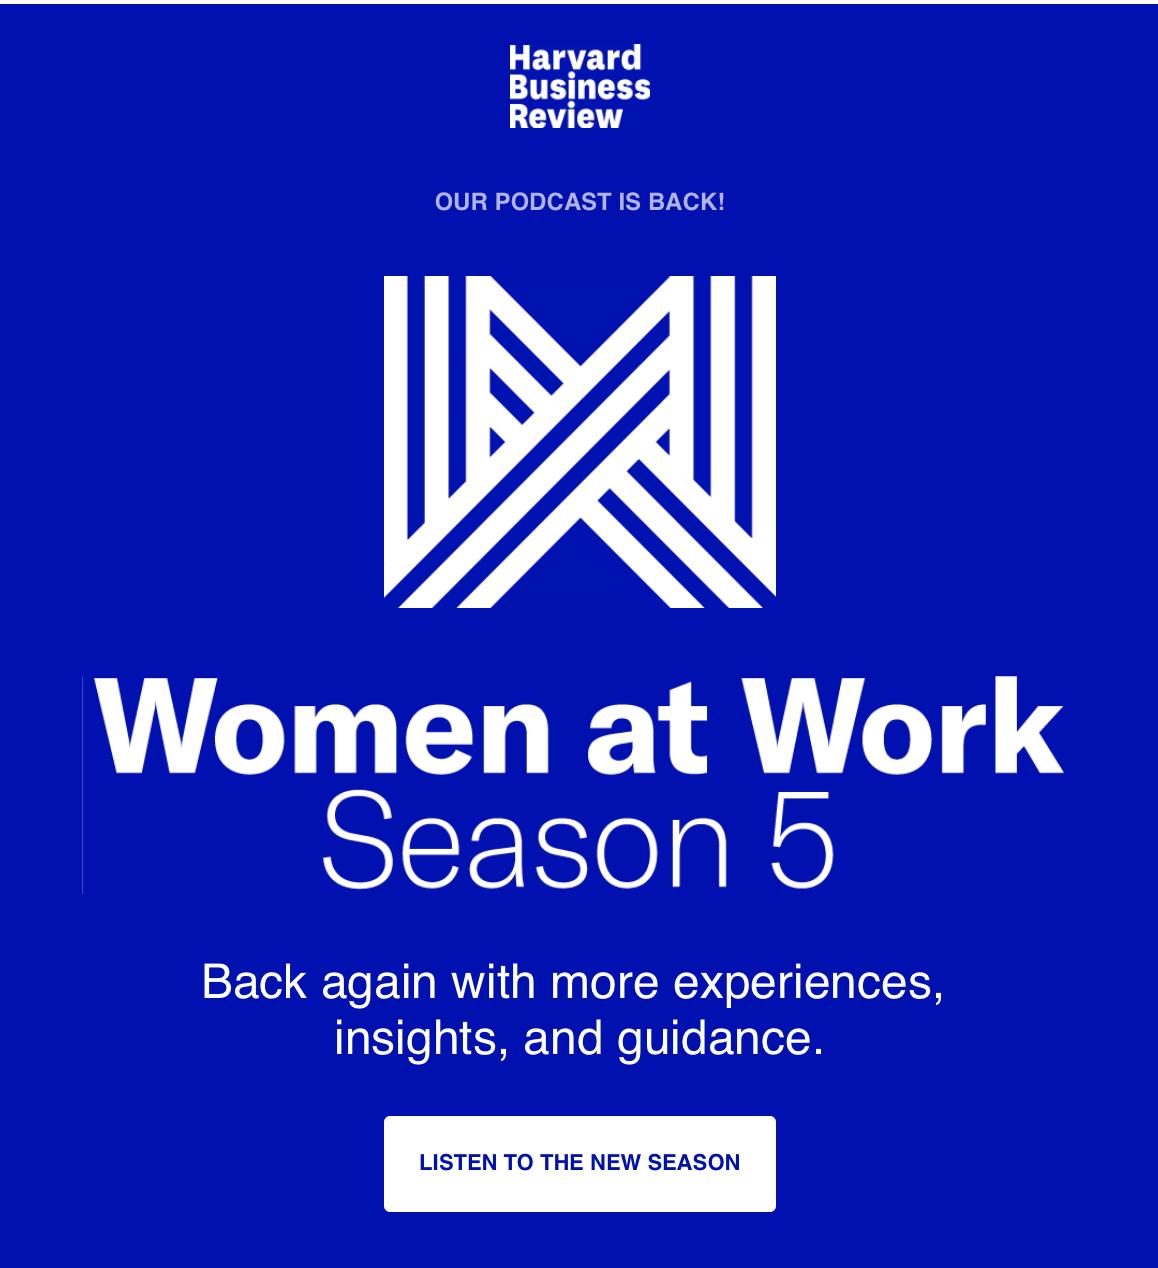 Podcast: Women at Work: Season 5